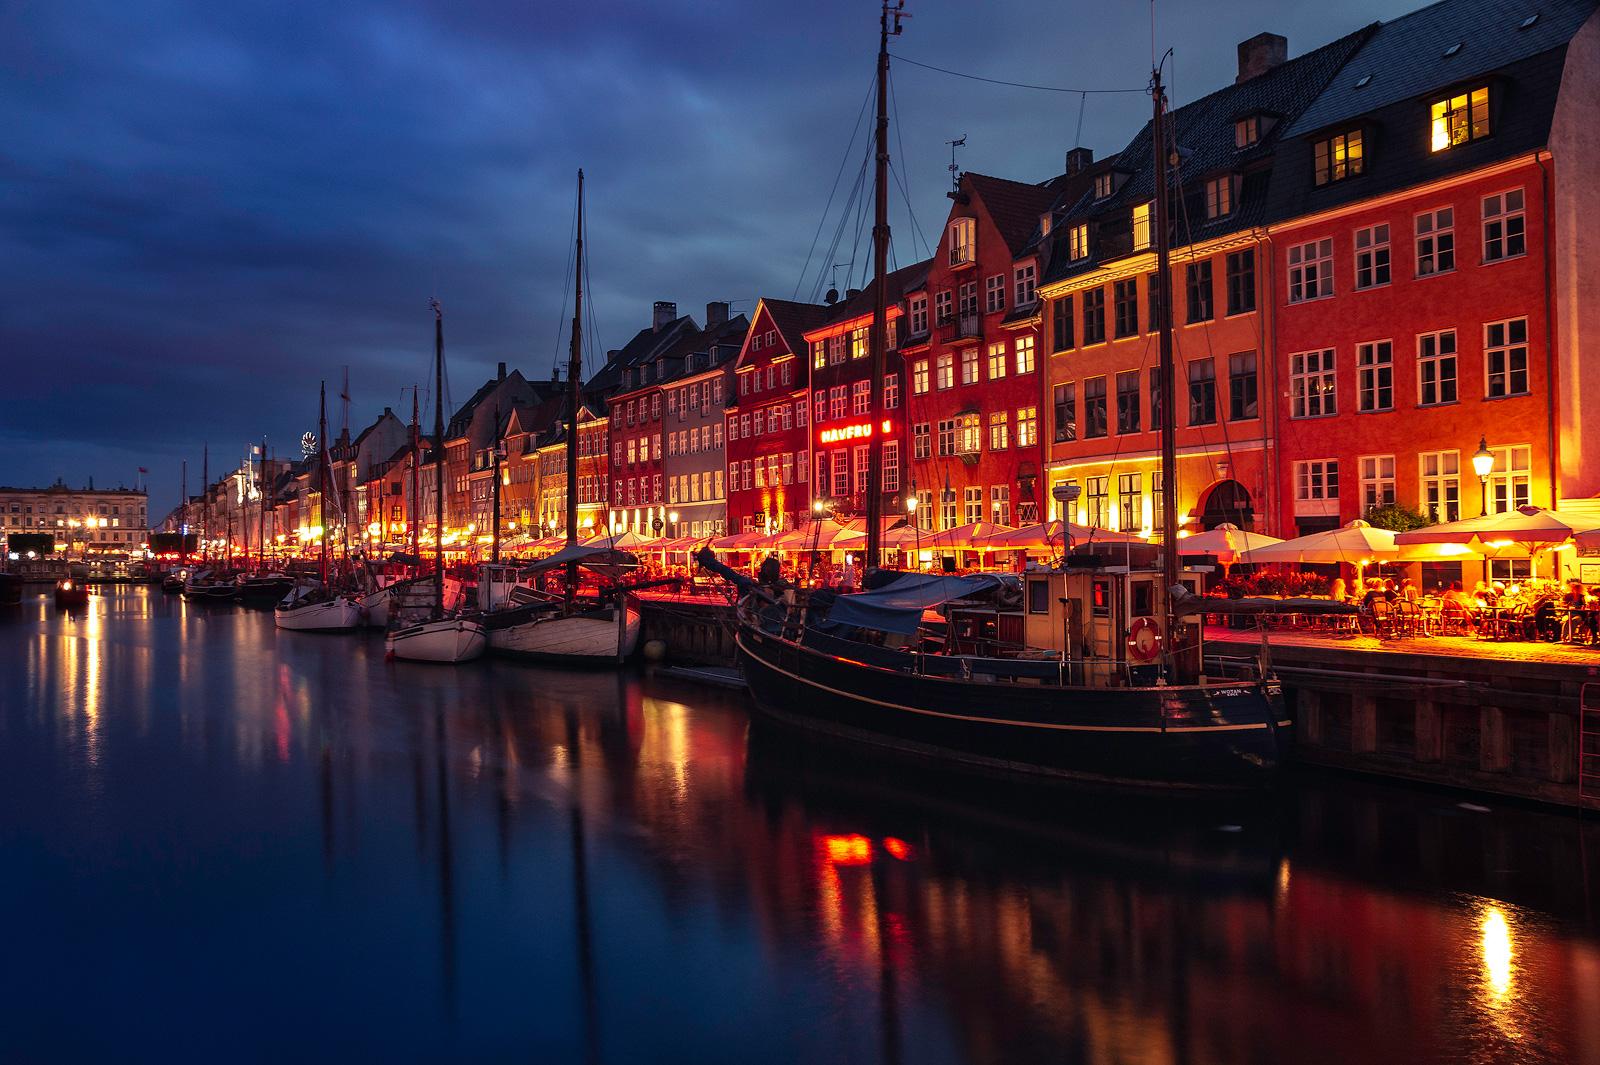 Jahresrückblick Mai 2018: Nyhavn in Kopenhagen